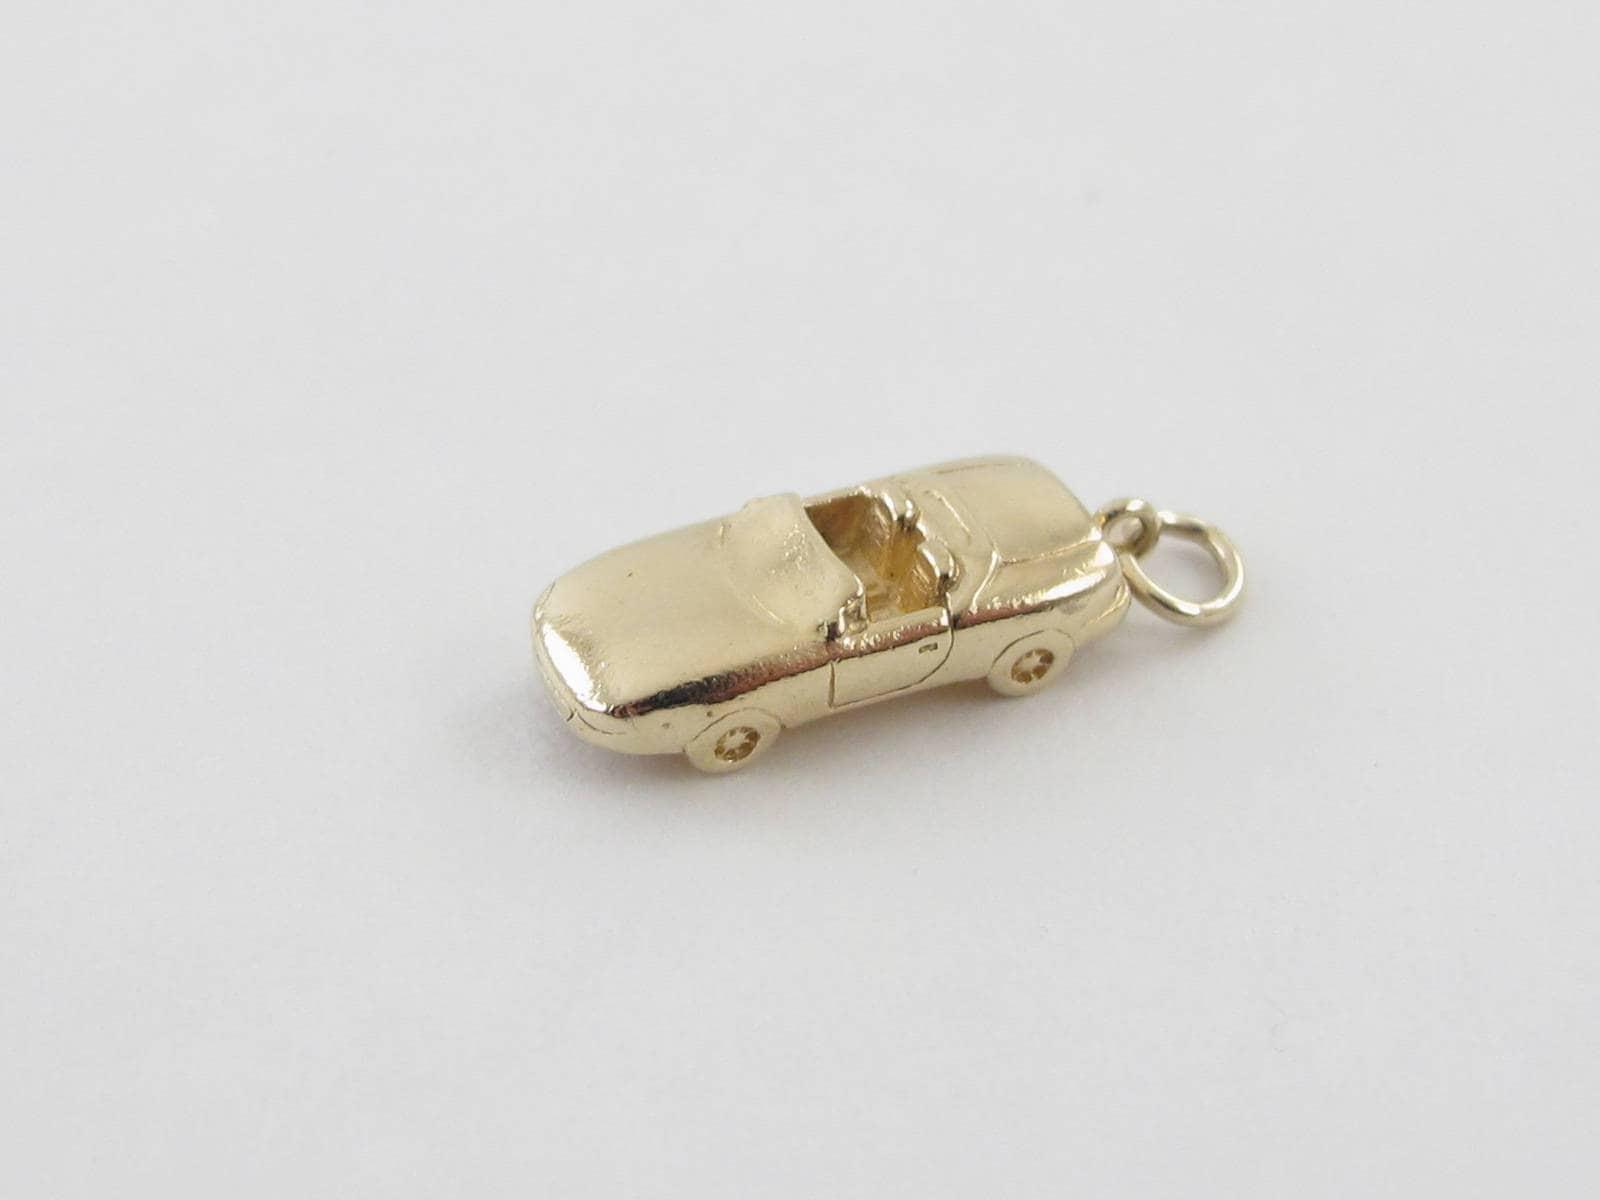 14k jaune or Vintage Vintage or pendentif Charm voiture - 14k or jaune Automobile charme f88db1